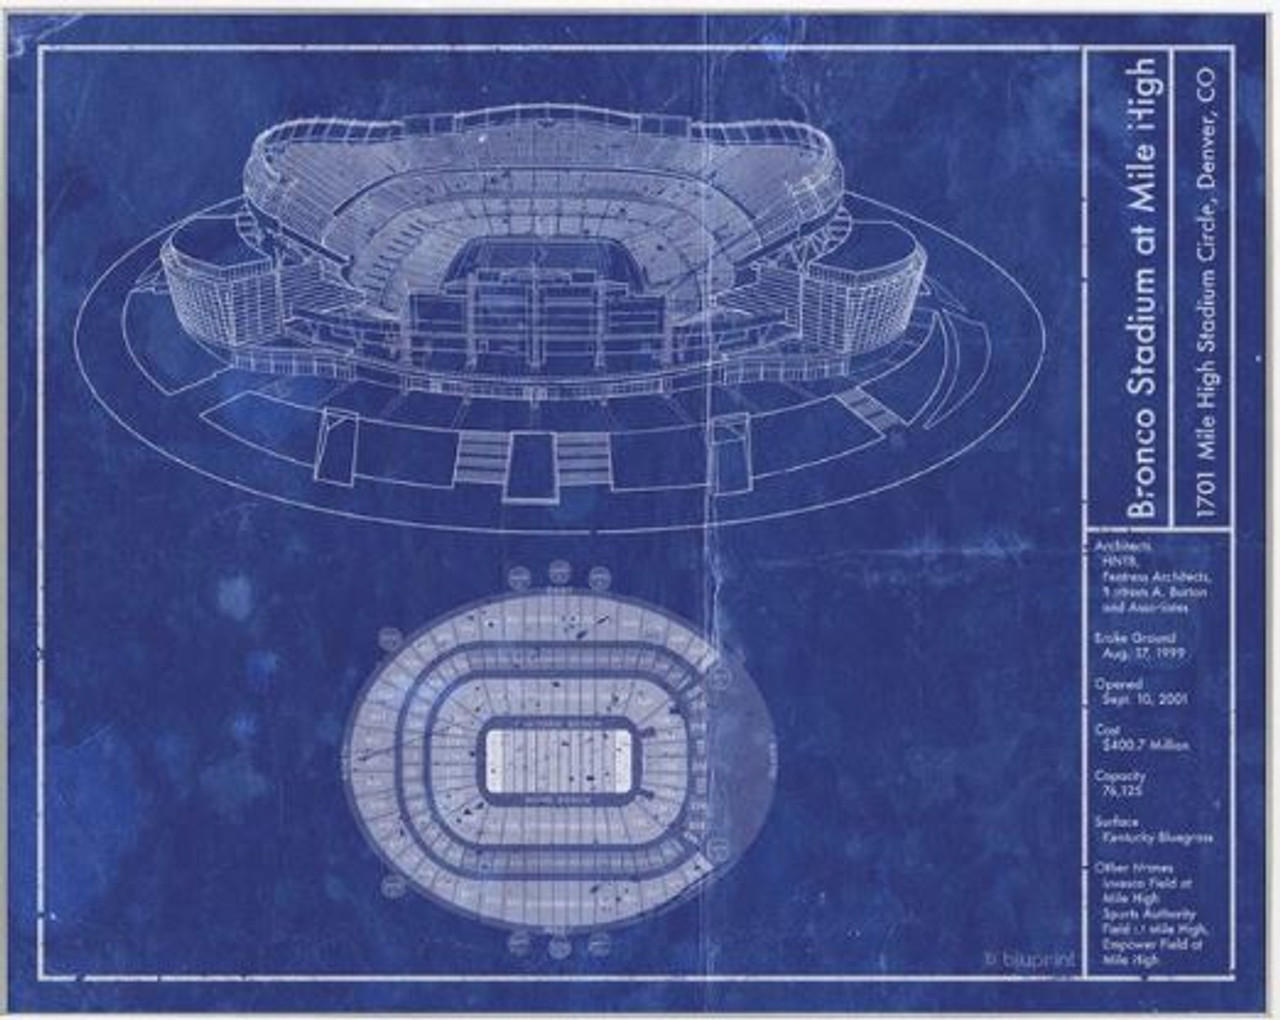 bronco stadium at mile high denver broncos blueprint poster